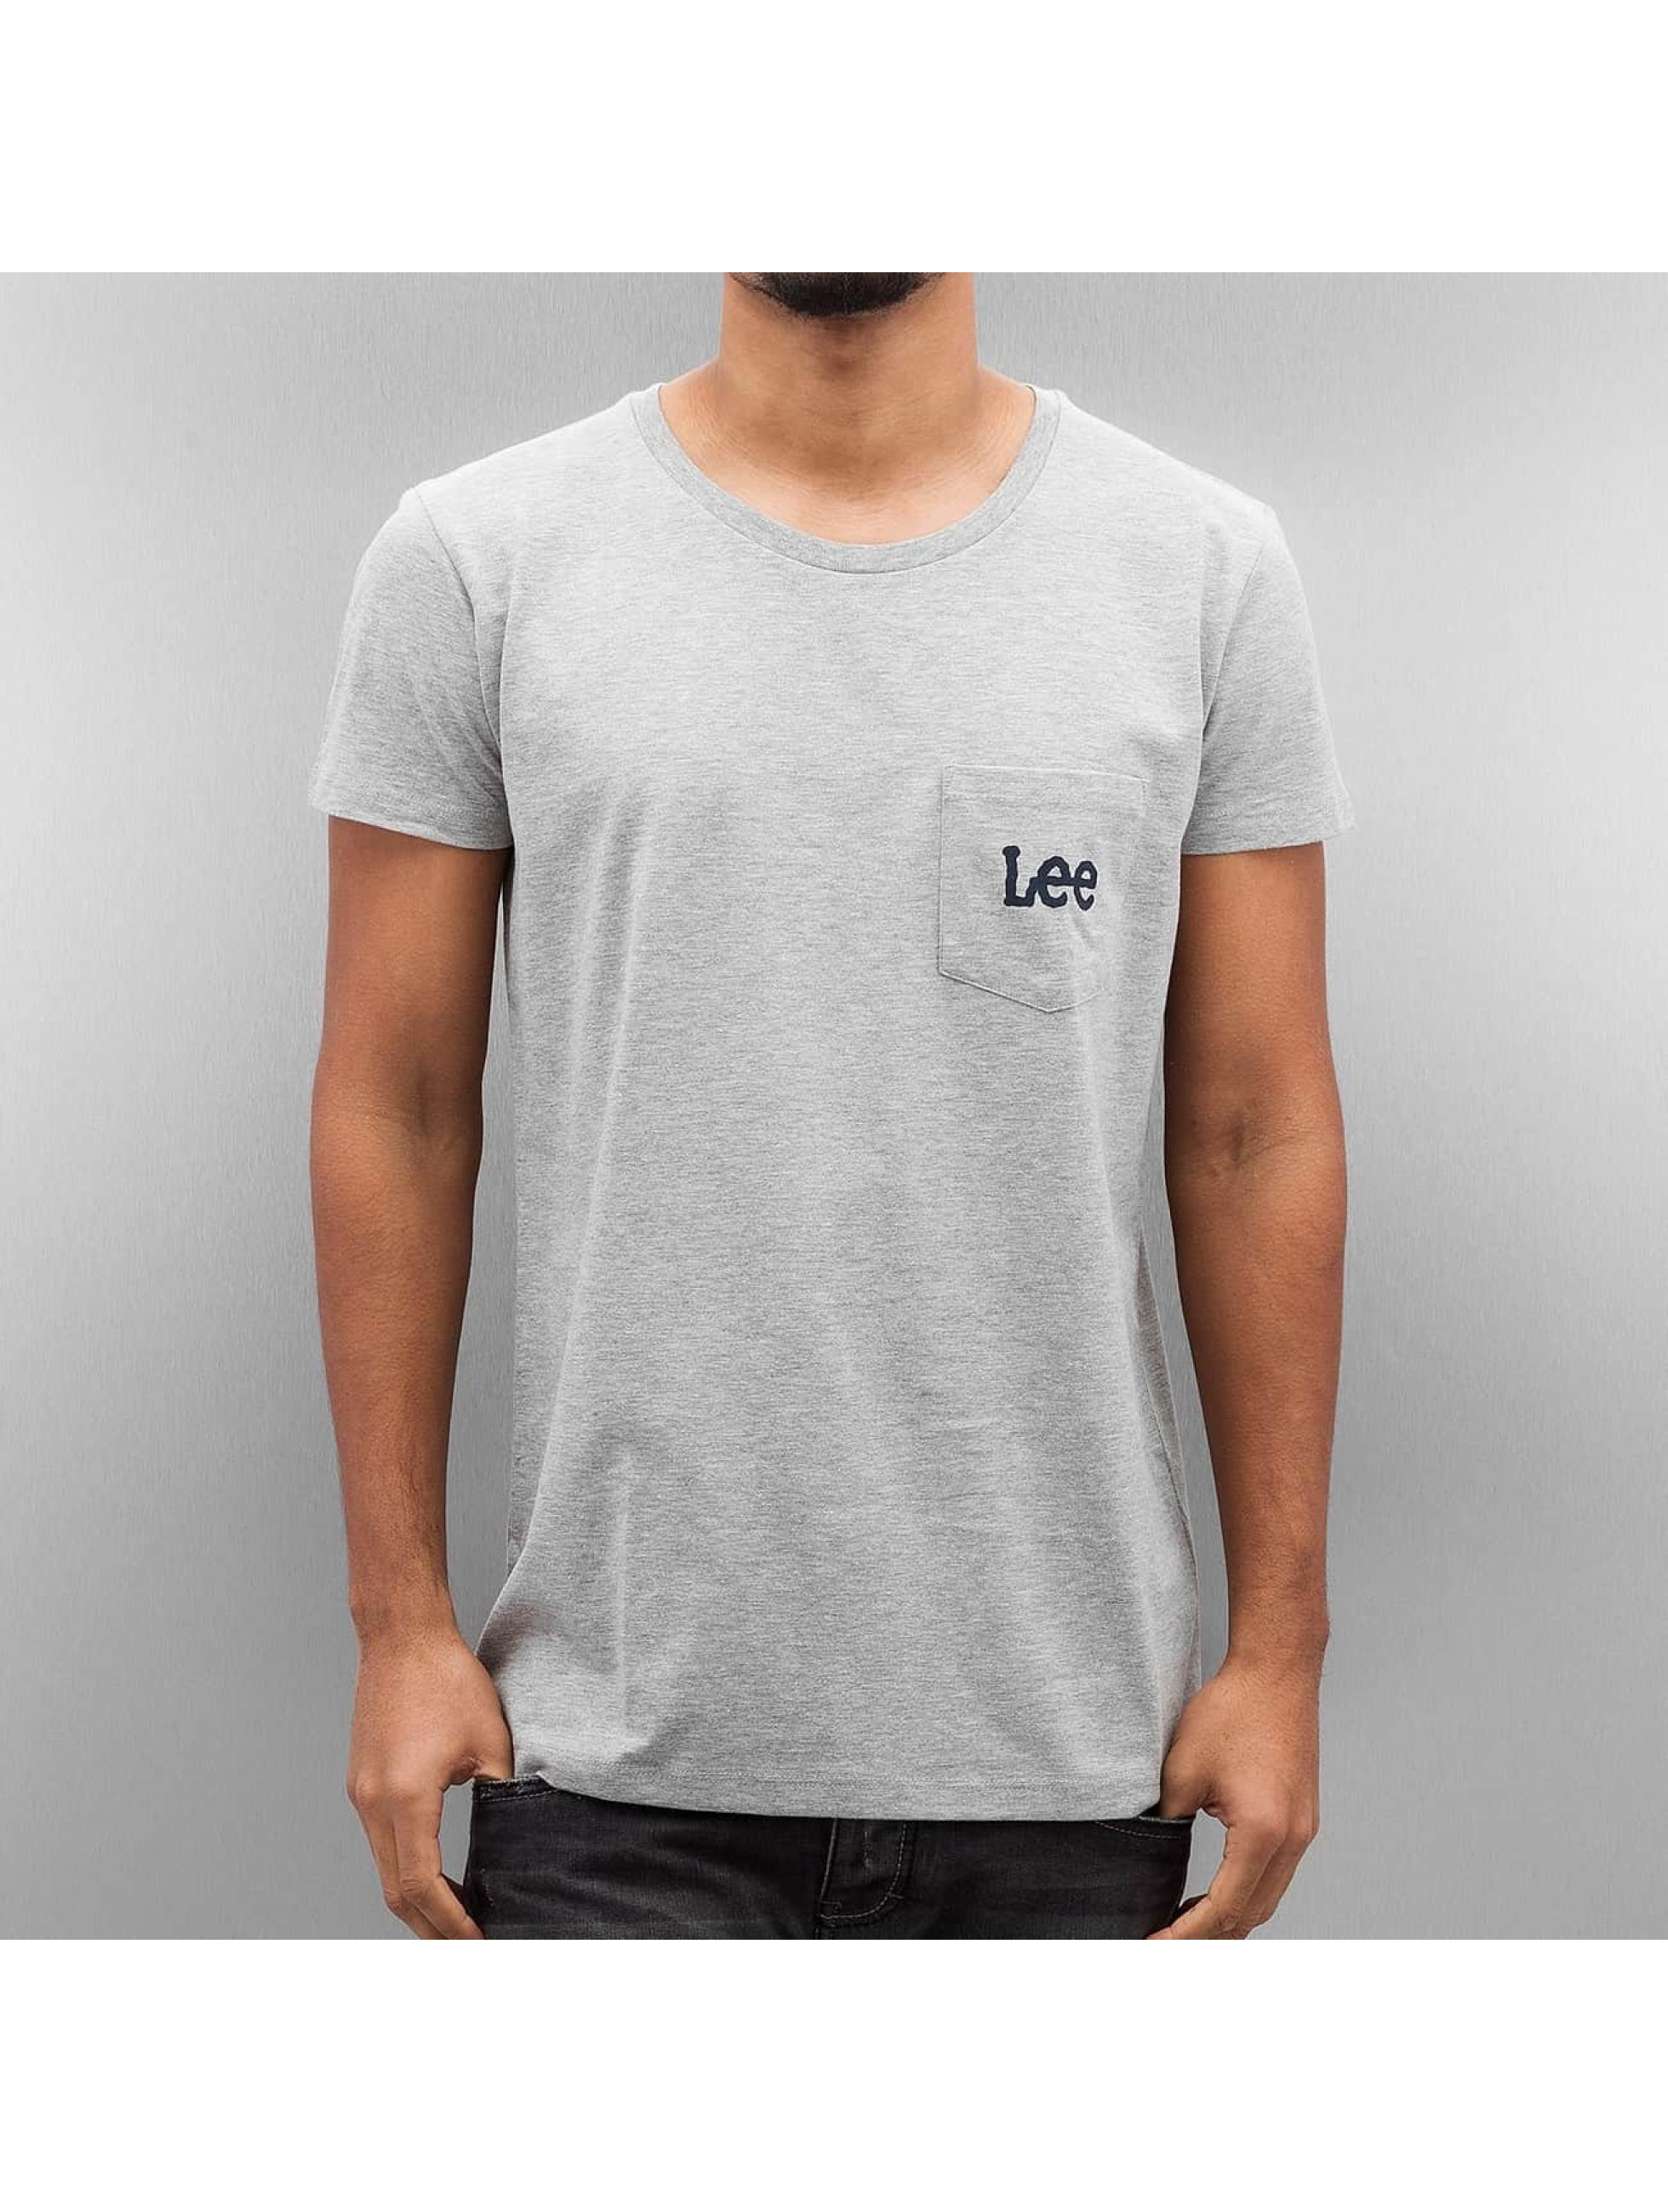 Lee Tričká Pocket šedá